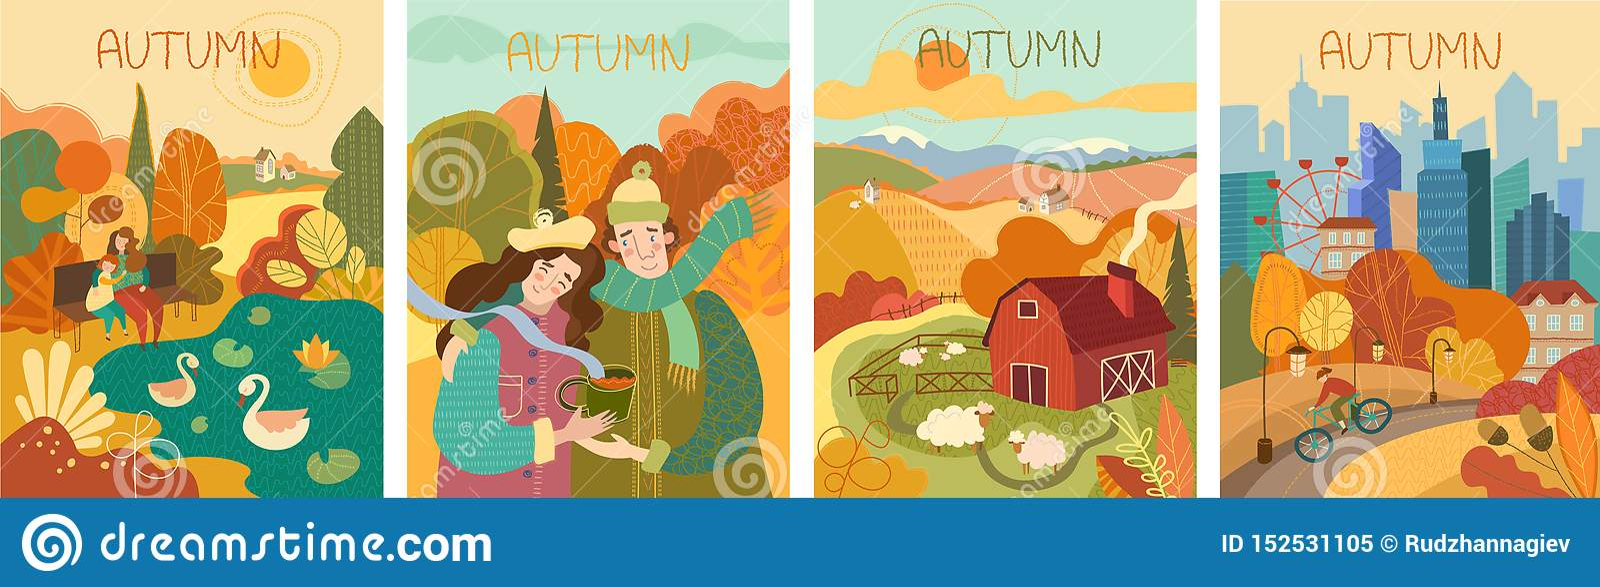 Metta di quattro dipinti variopinti di vita di autunno